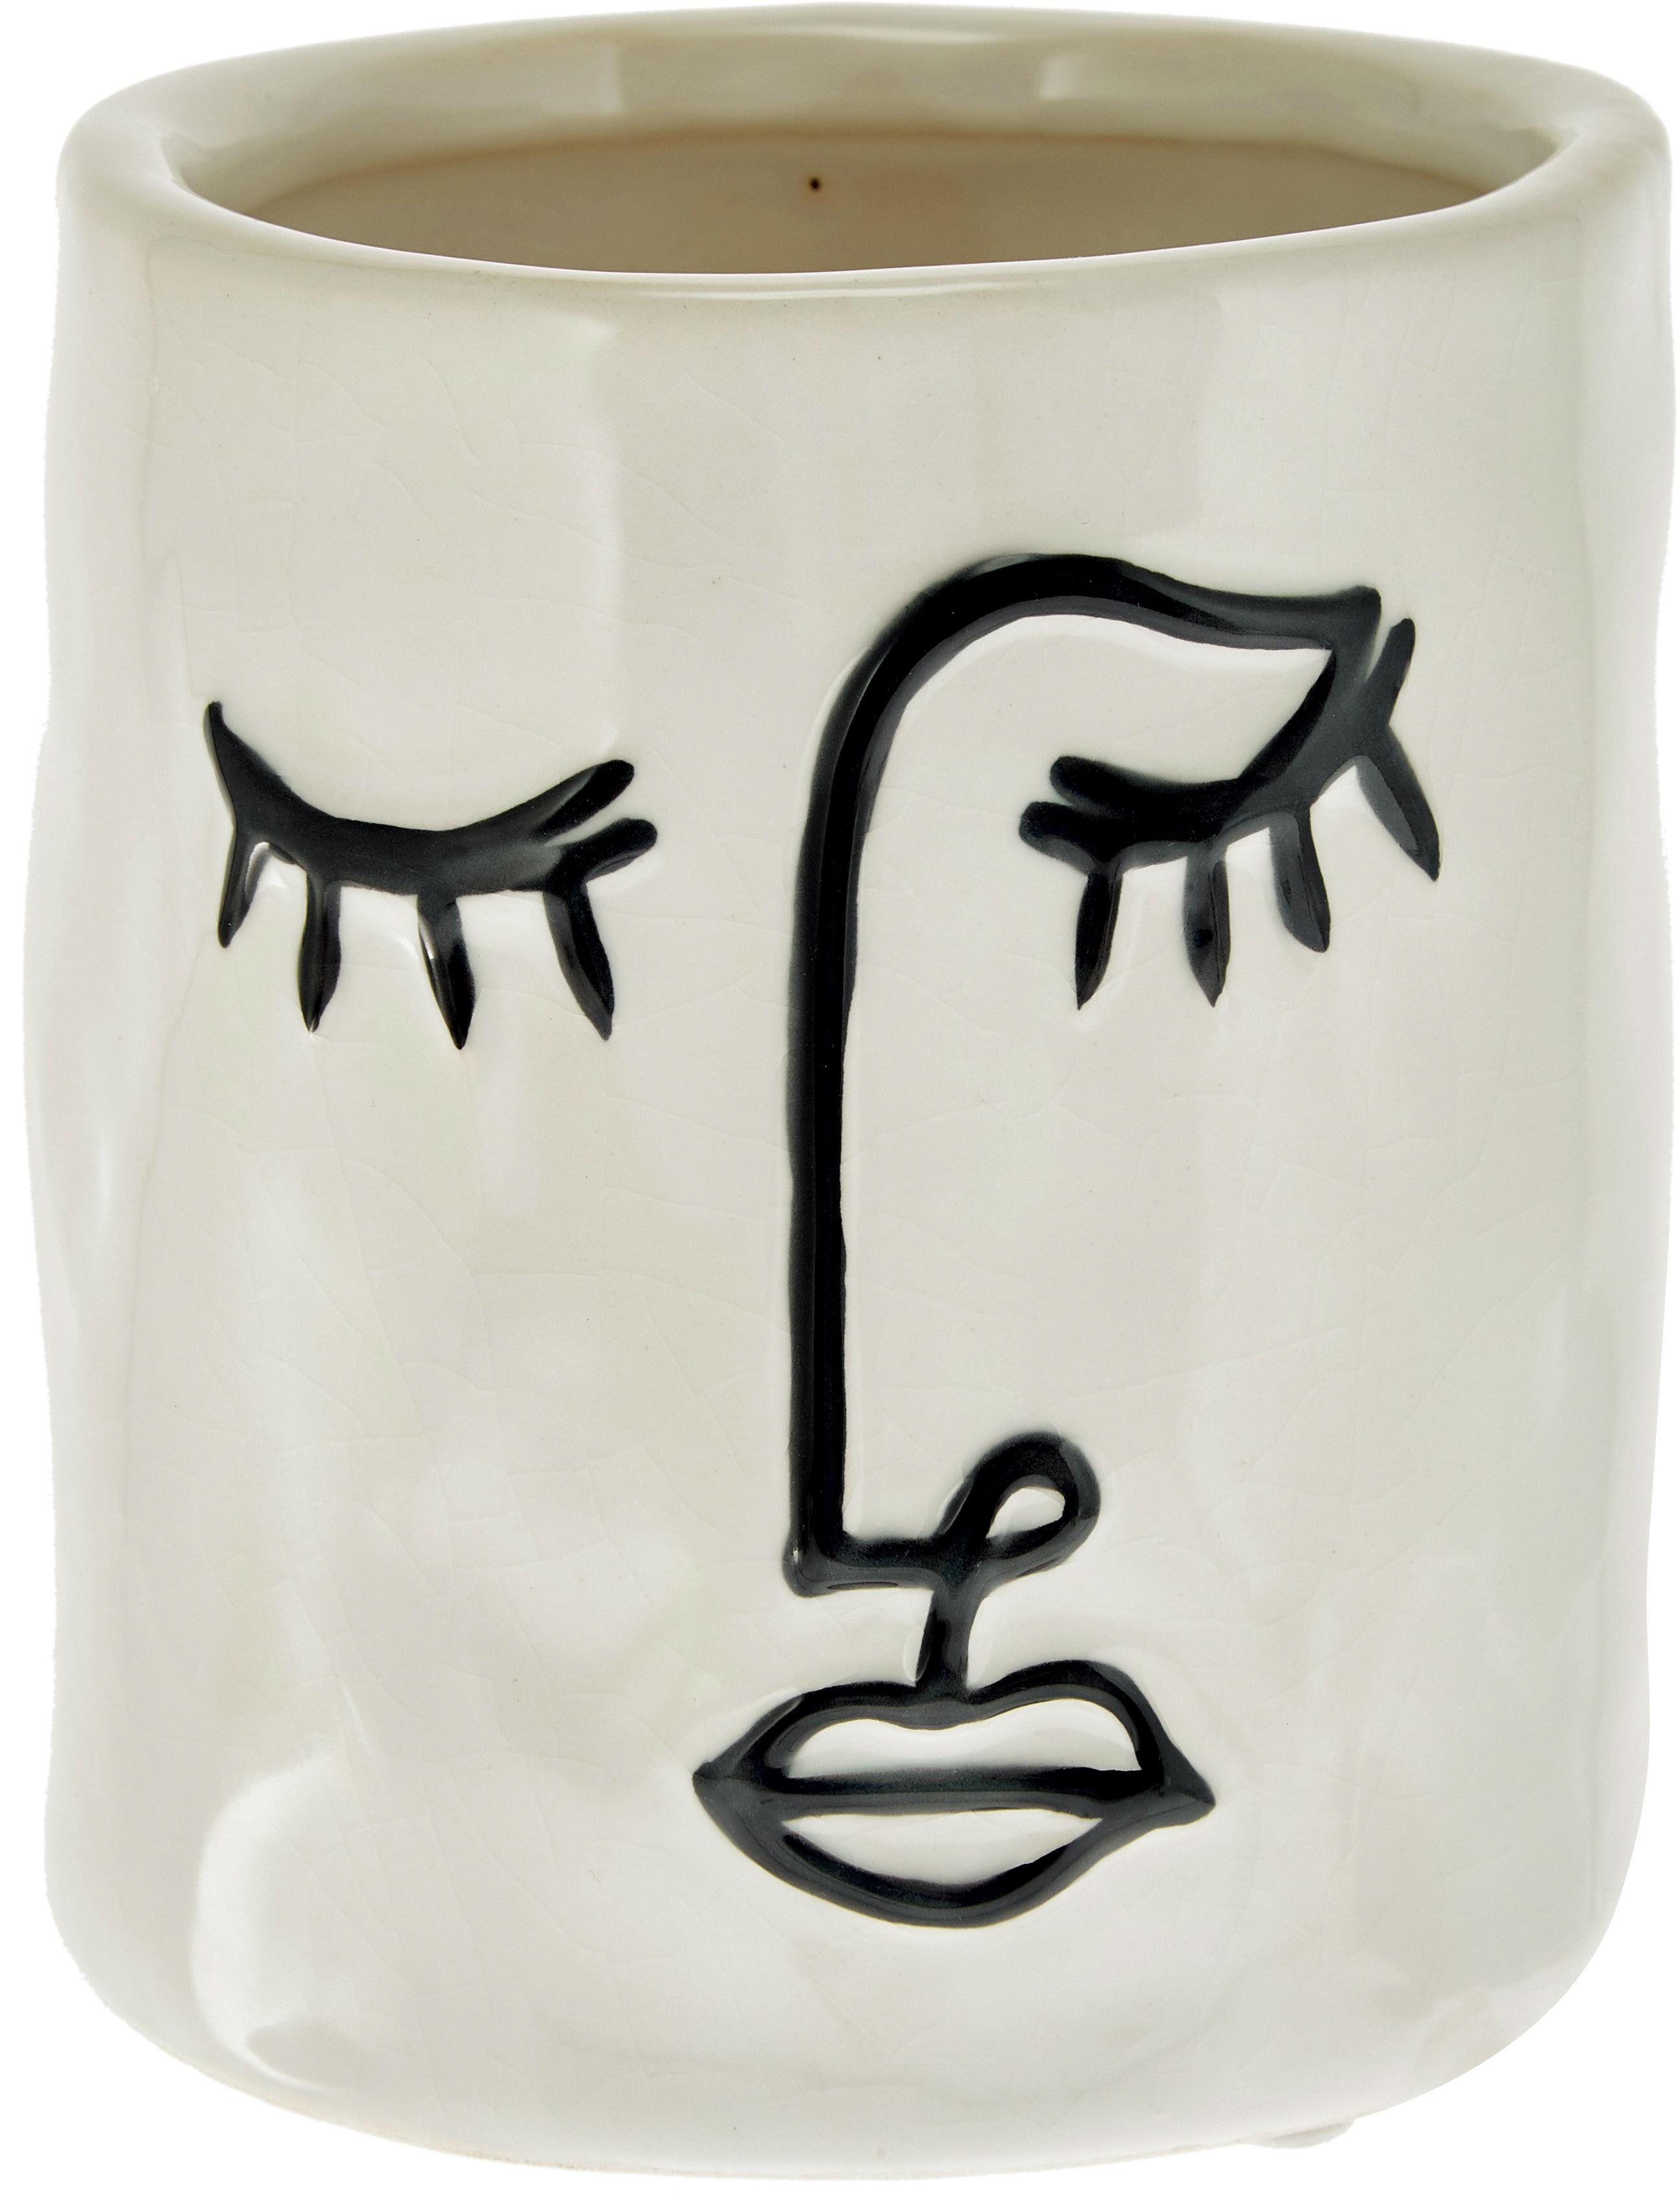 Portavaso in terracotta Face, Terracotta, Bianco latteo, nero, Ø 12 x Alt. 13 cm